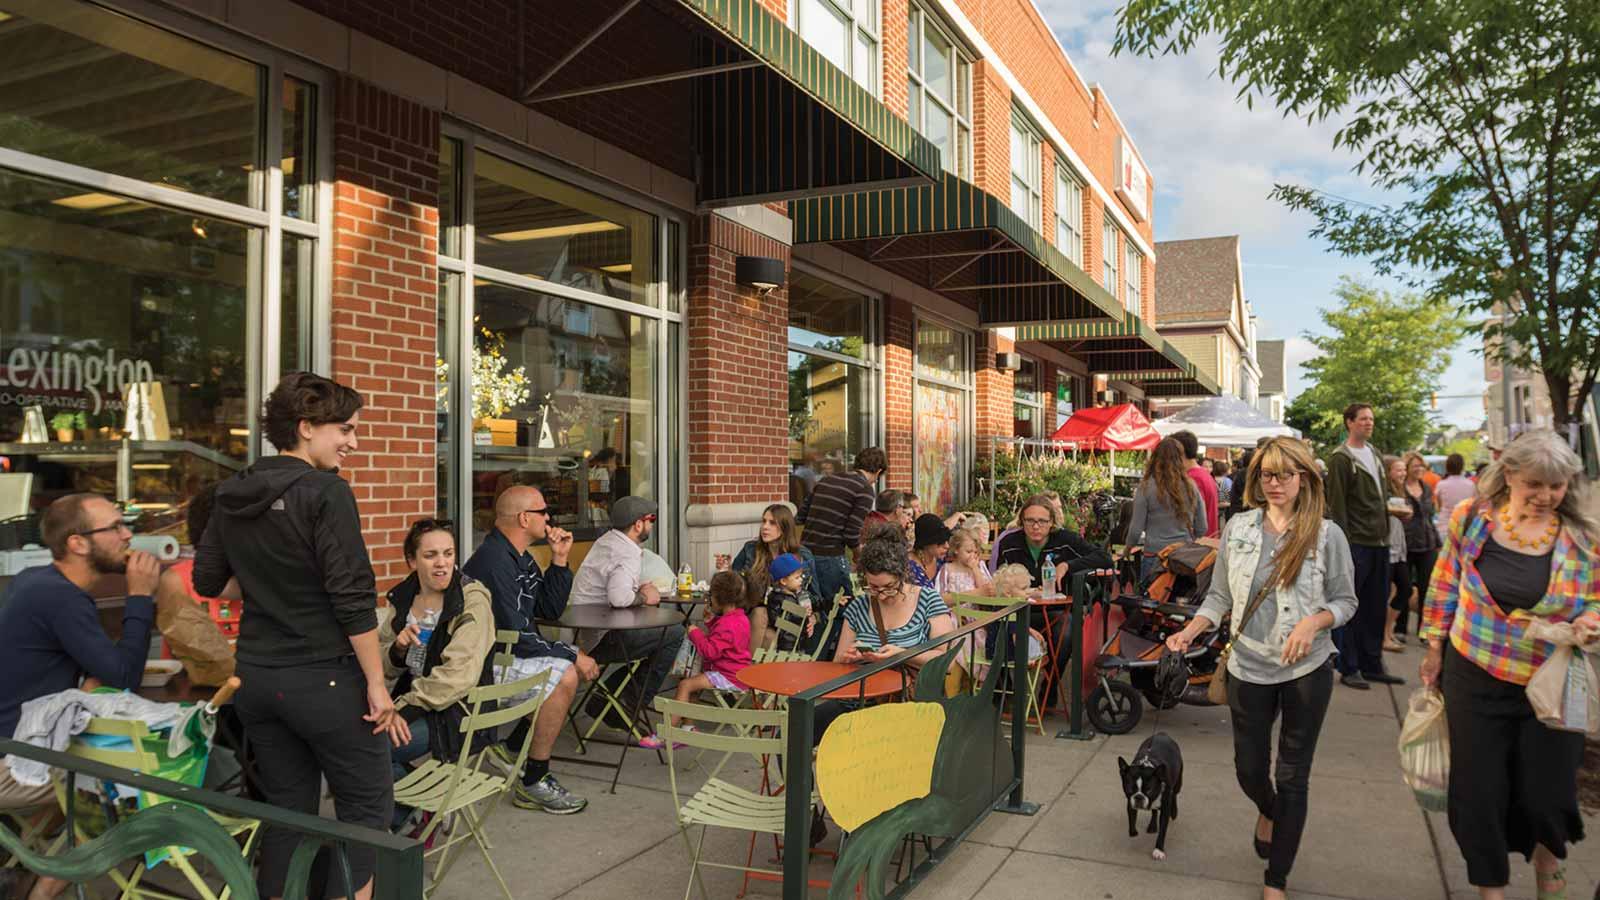 Elmwood Village in Buffalo, NY | Visit Buffalo Niagara